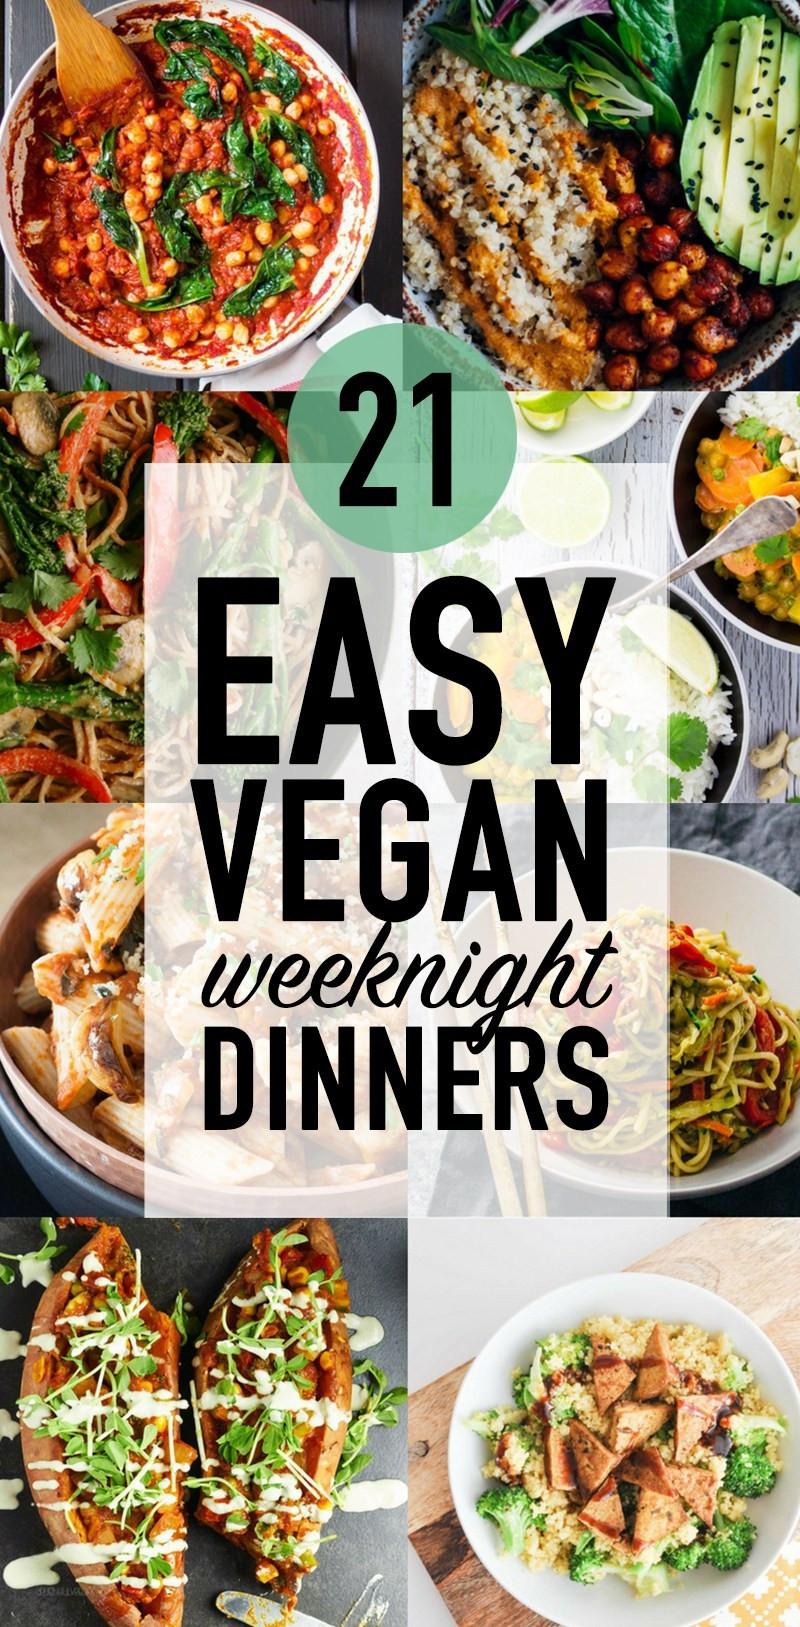 Good Vegan Dinners  21 Easy Vegan Weeknight Dinners Wallflower Kitchen